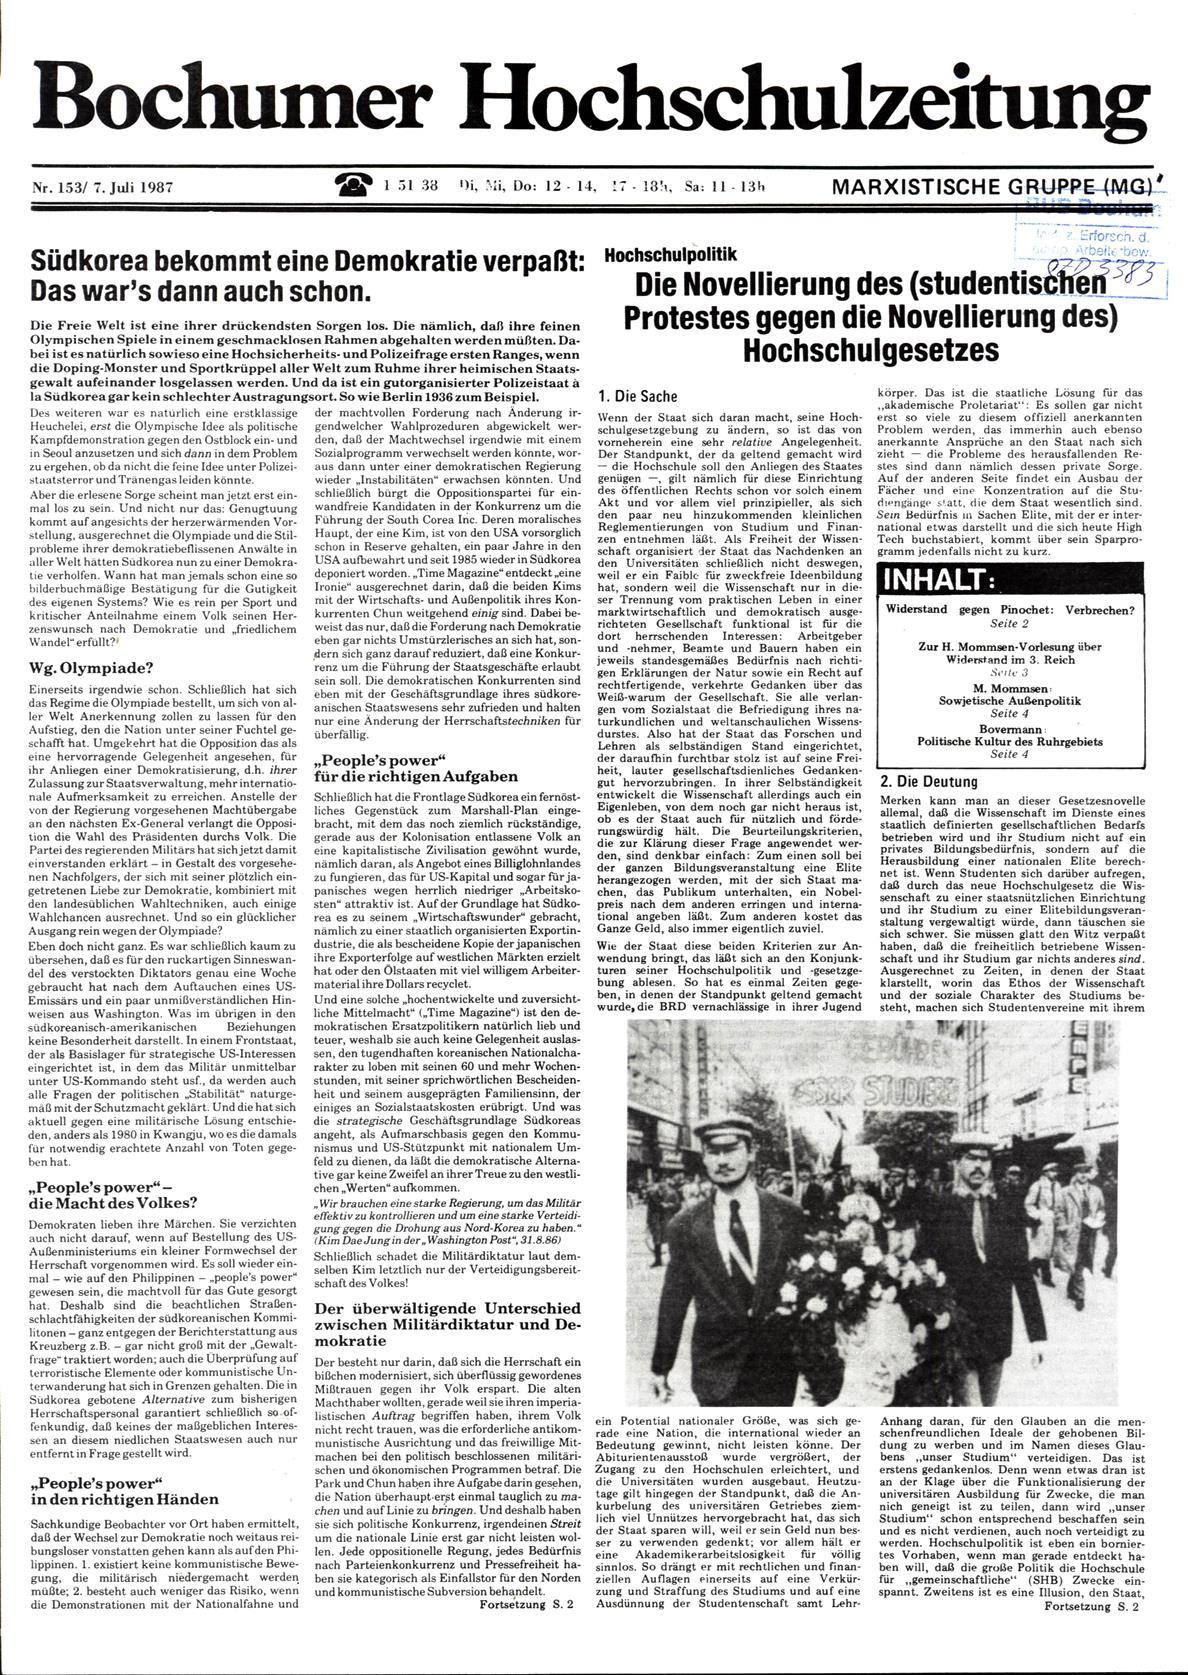 Bochum_BHZ_19870707_153_001